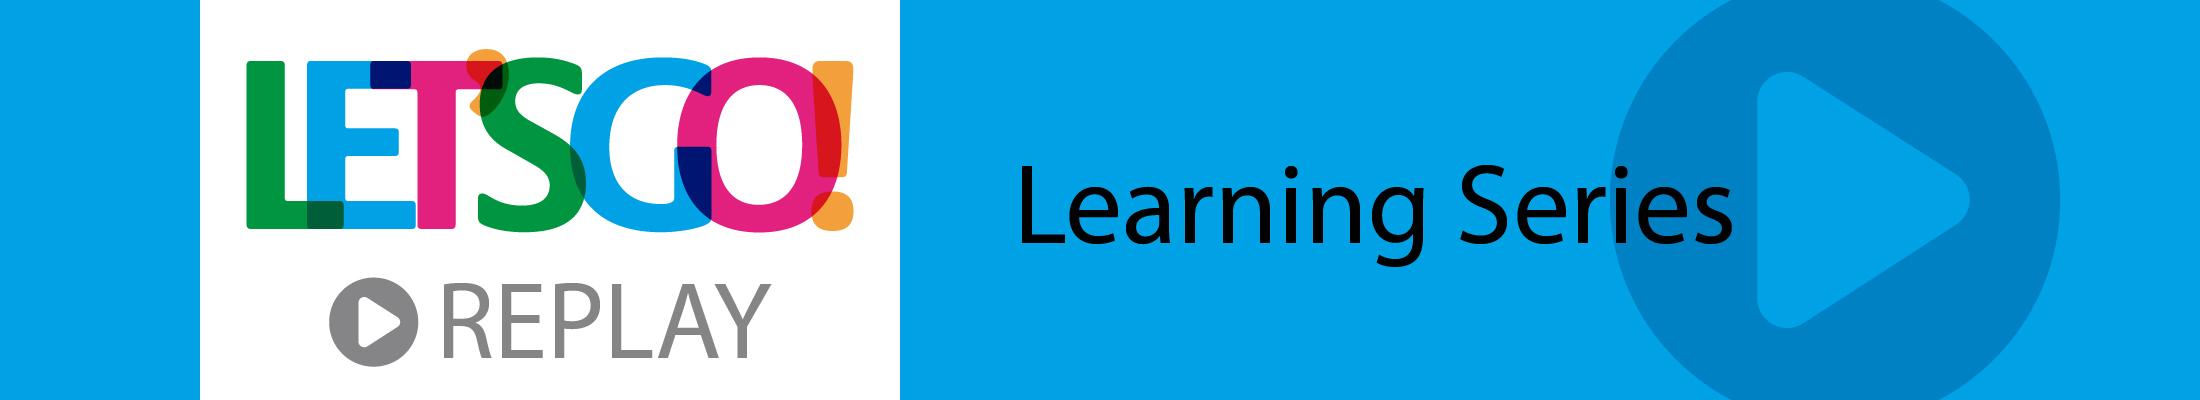 LetsGo Video Page 05-17-20_02_Landpg_2200x400px